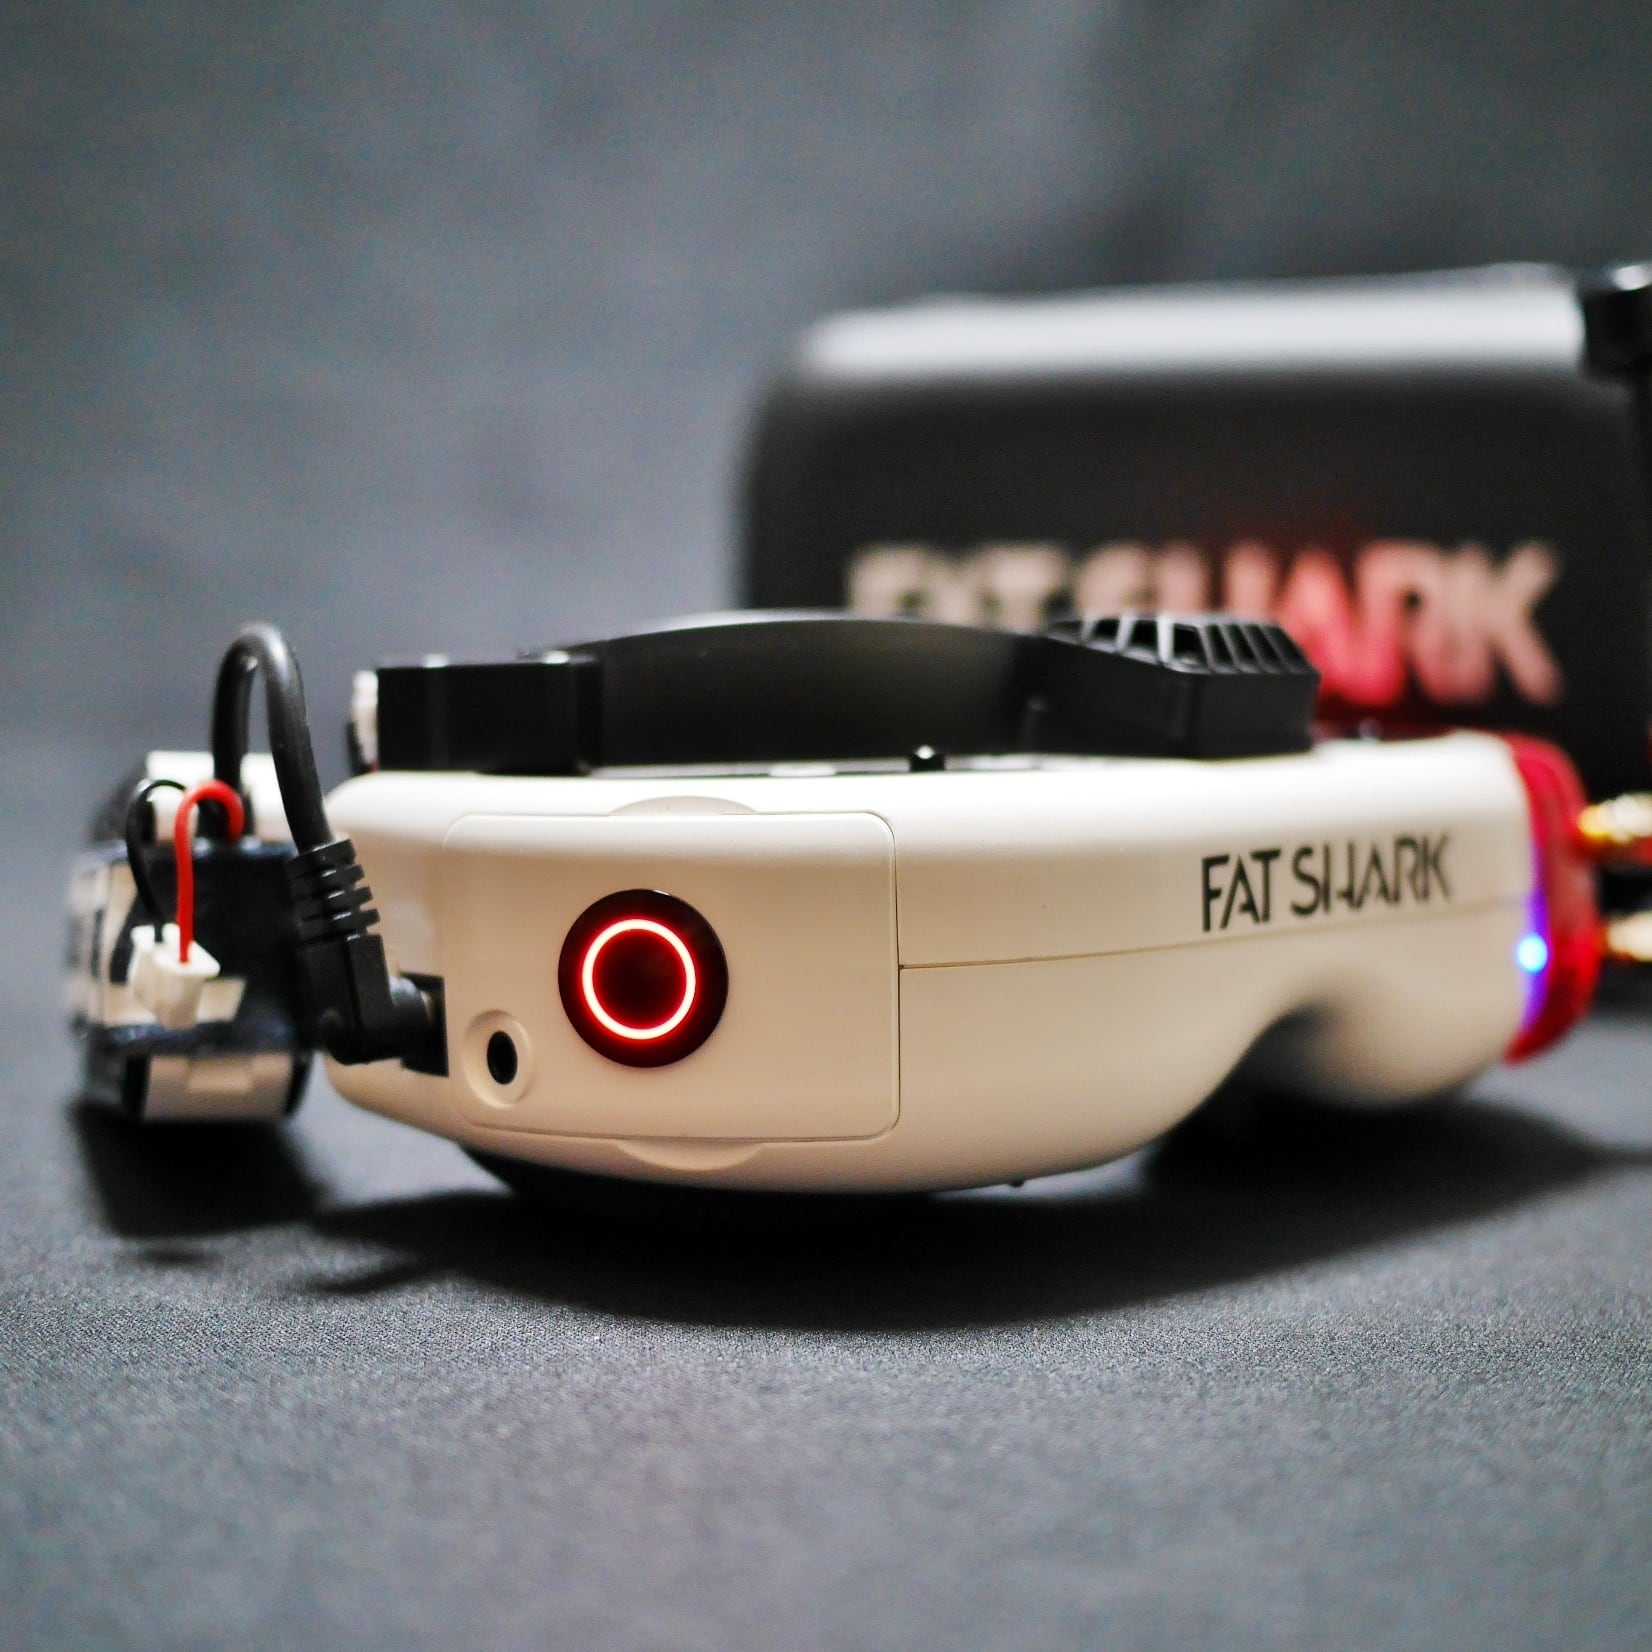 Fat Shark HDO電源ボタン改造 ※他商品との同梱不可